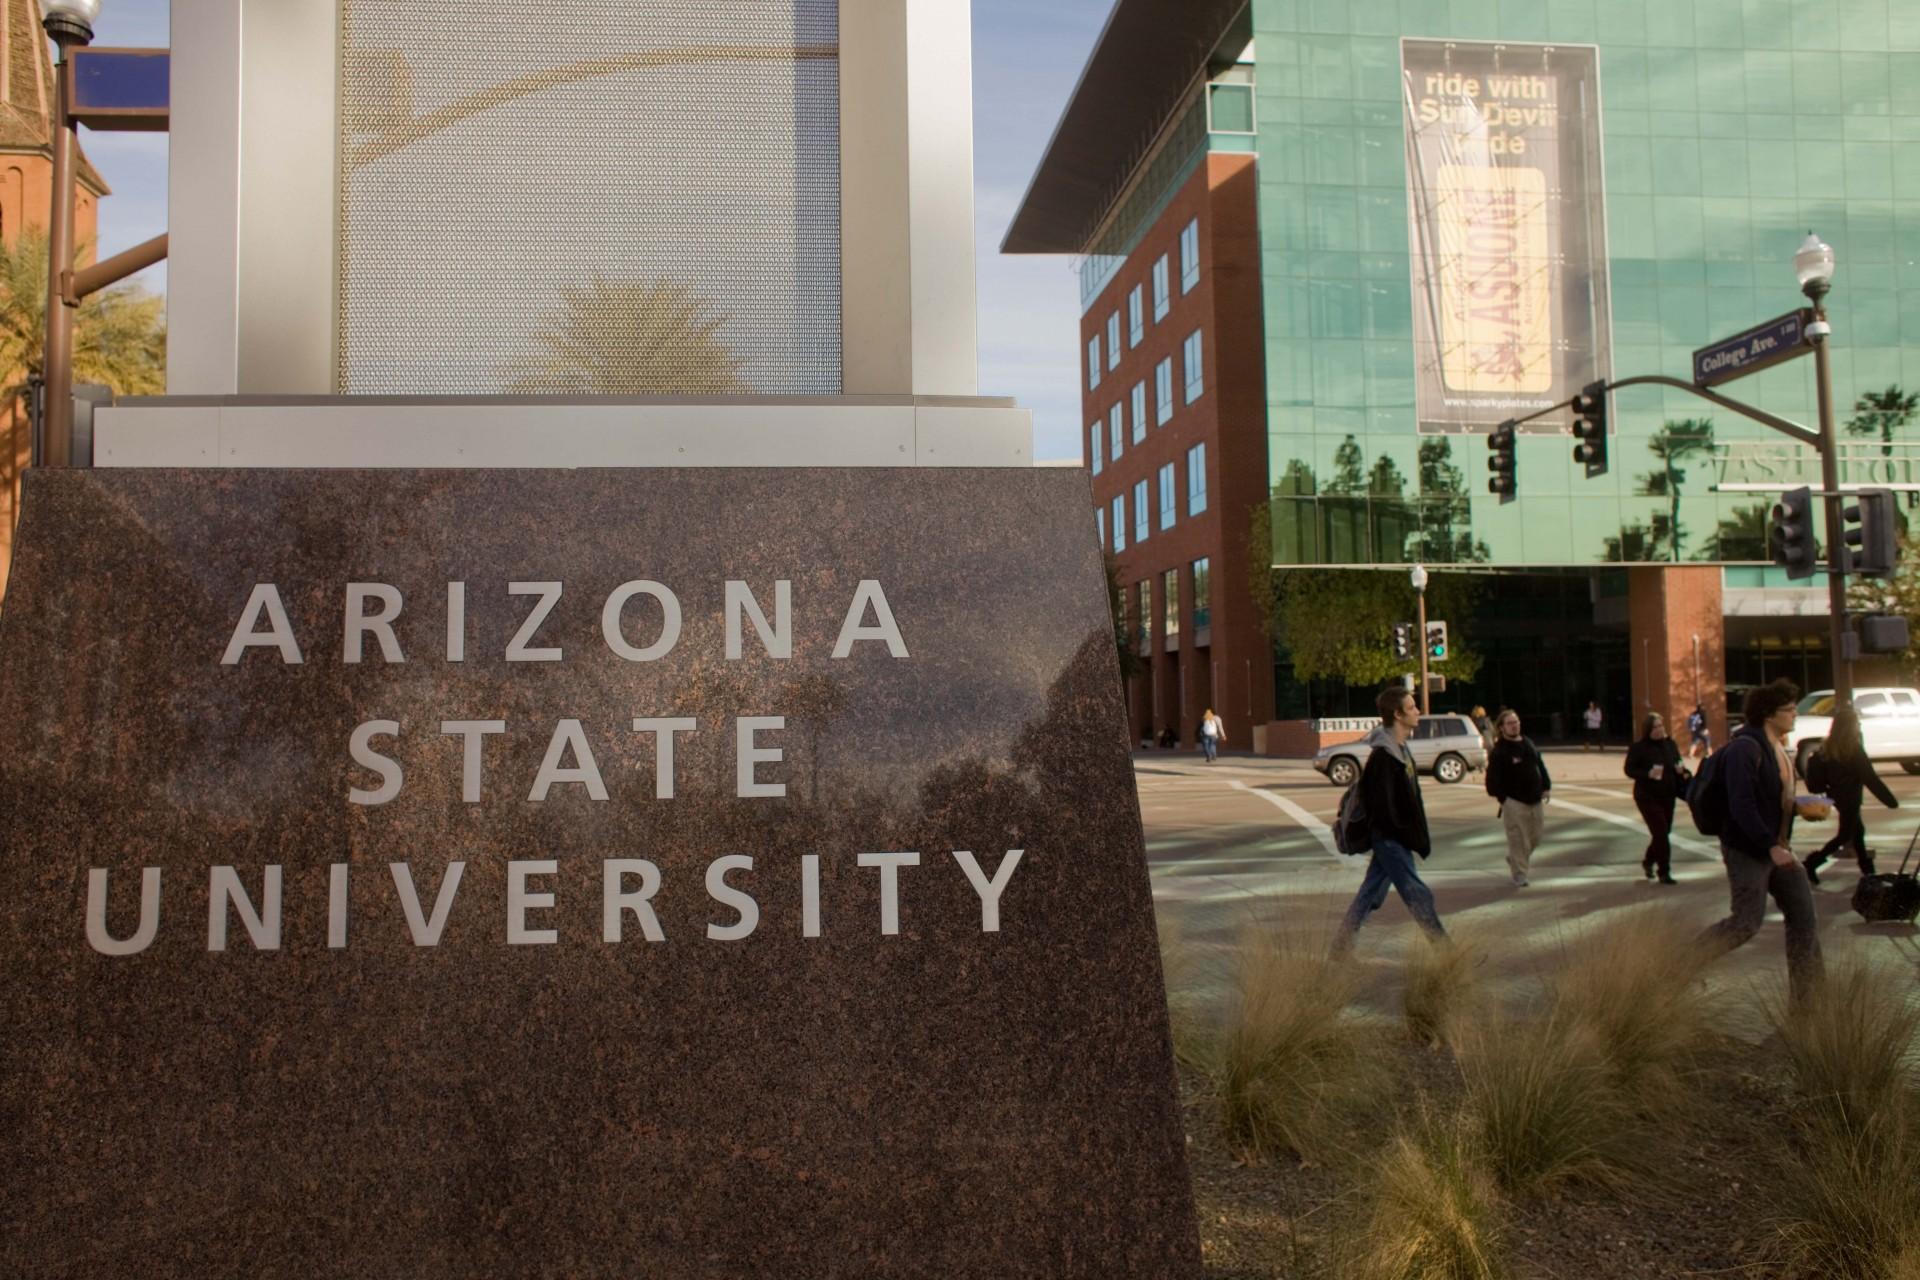 007 Essay Example University Of Arizona Honors College Prompt Stunning 1920